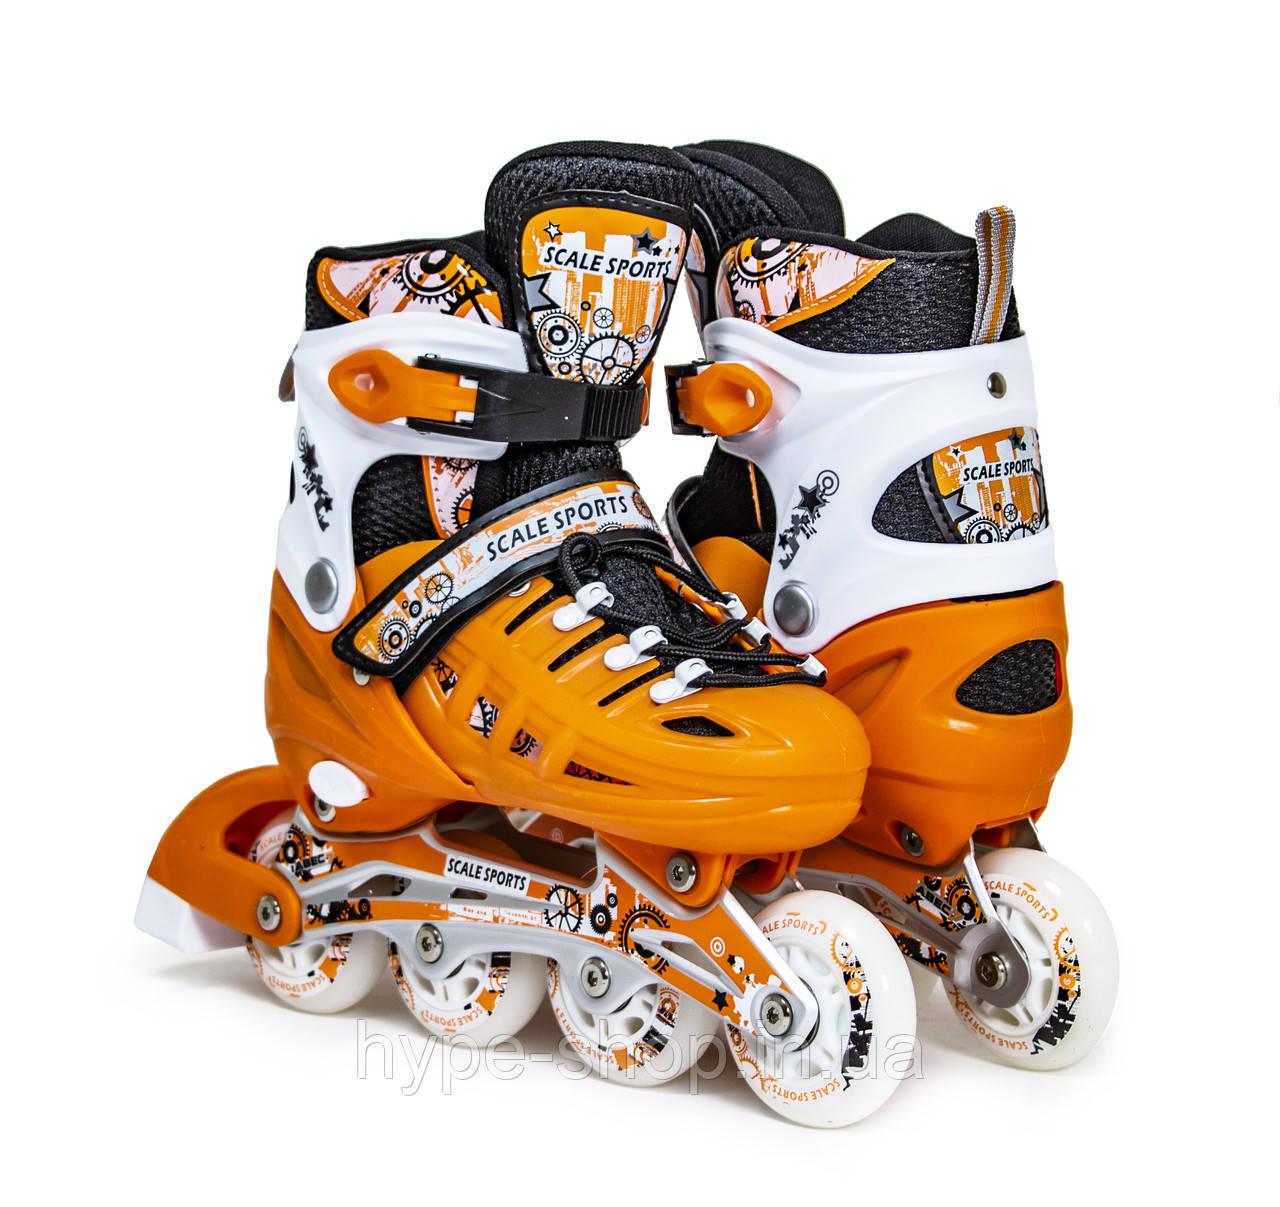 Ролики Scale Sports. Orange LF 905, размер 34-37